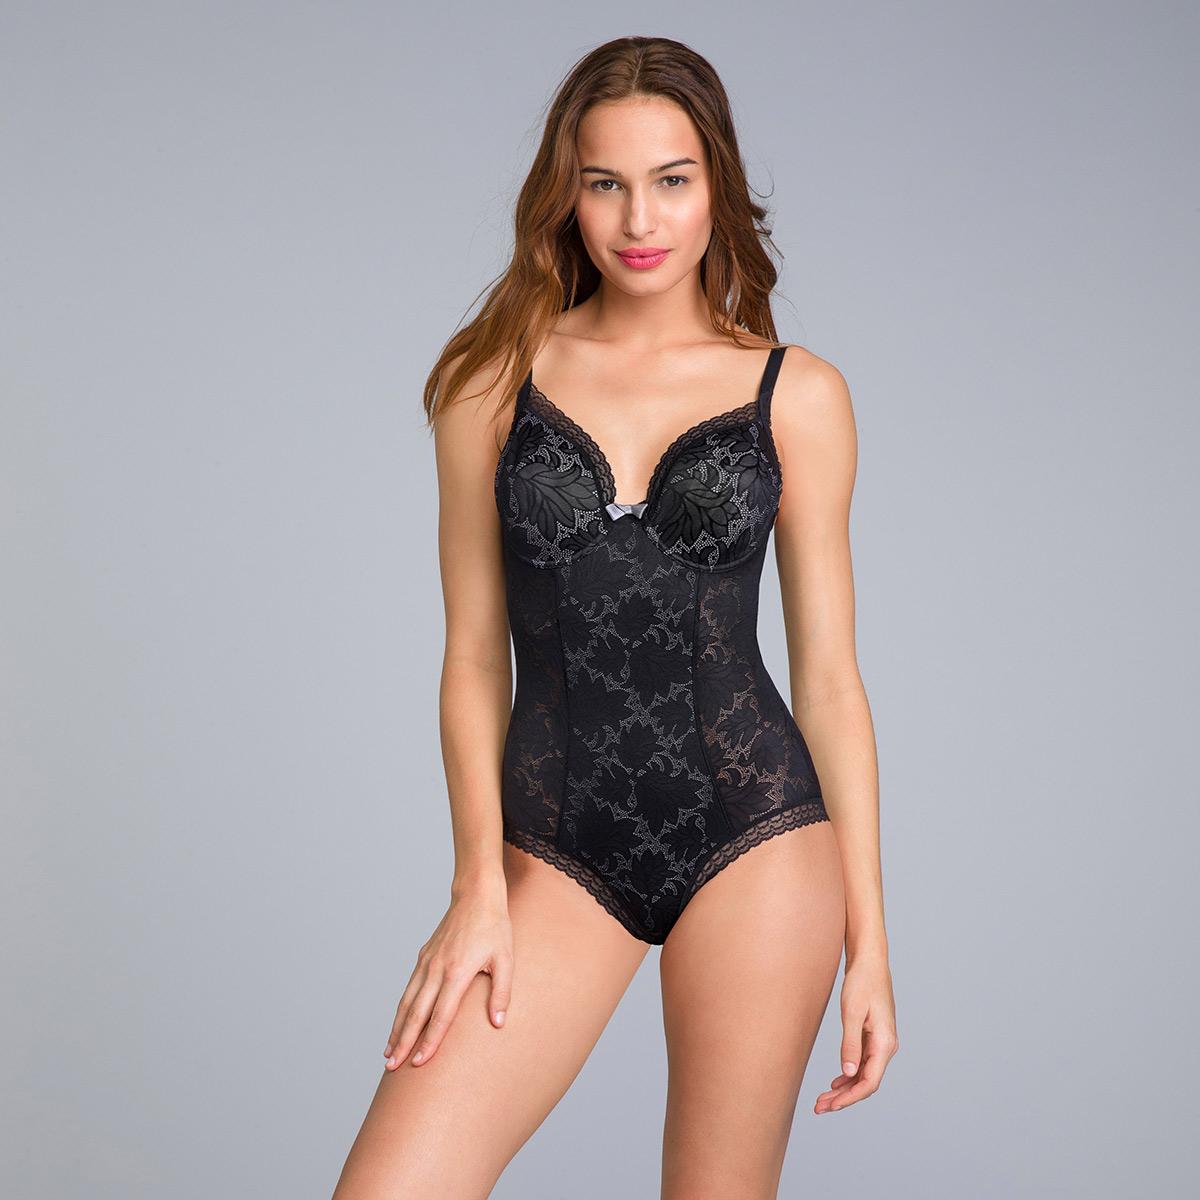 Body dentelle noir - Invisible Elegance b3eb45b9279